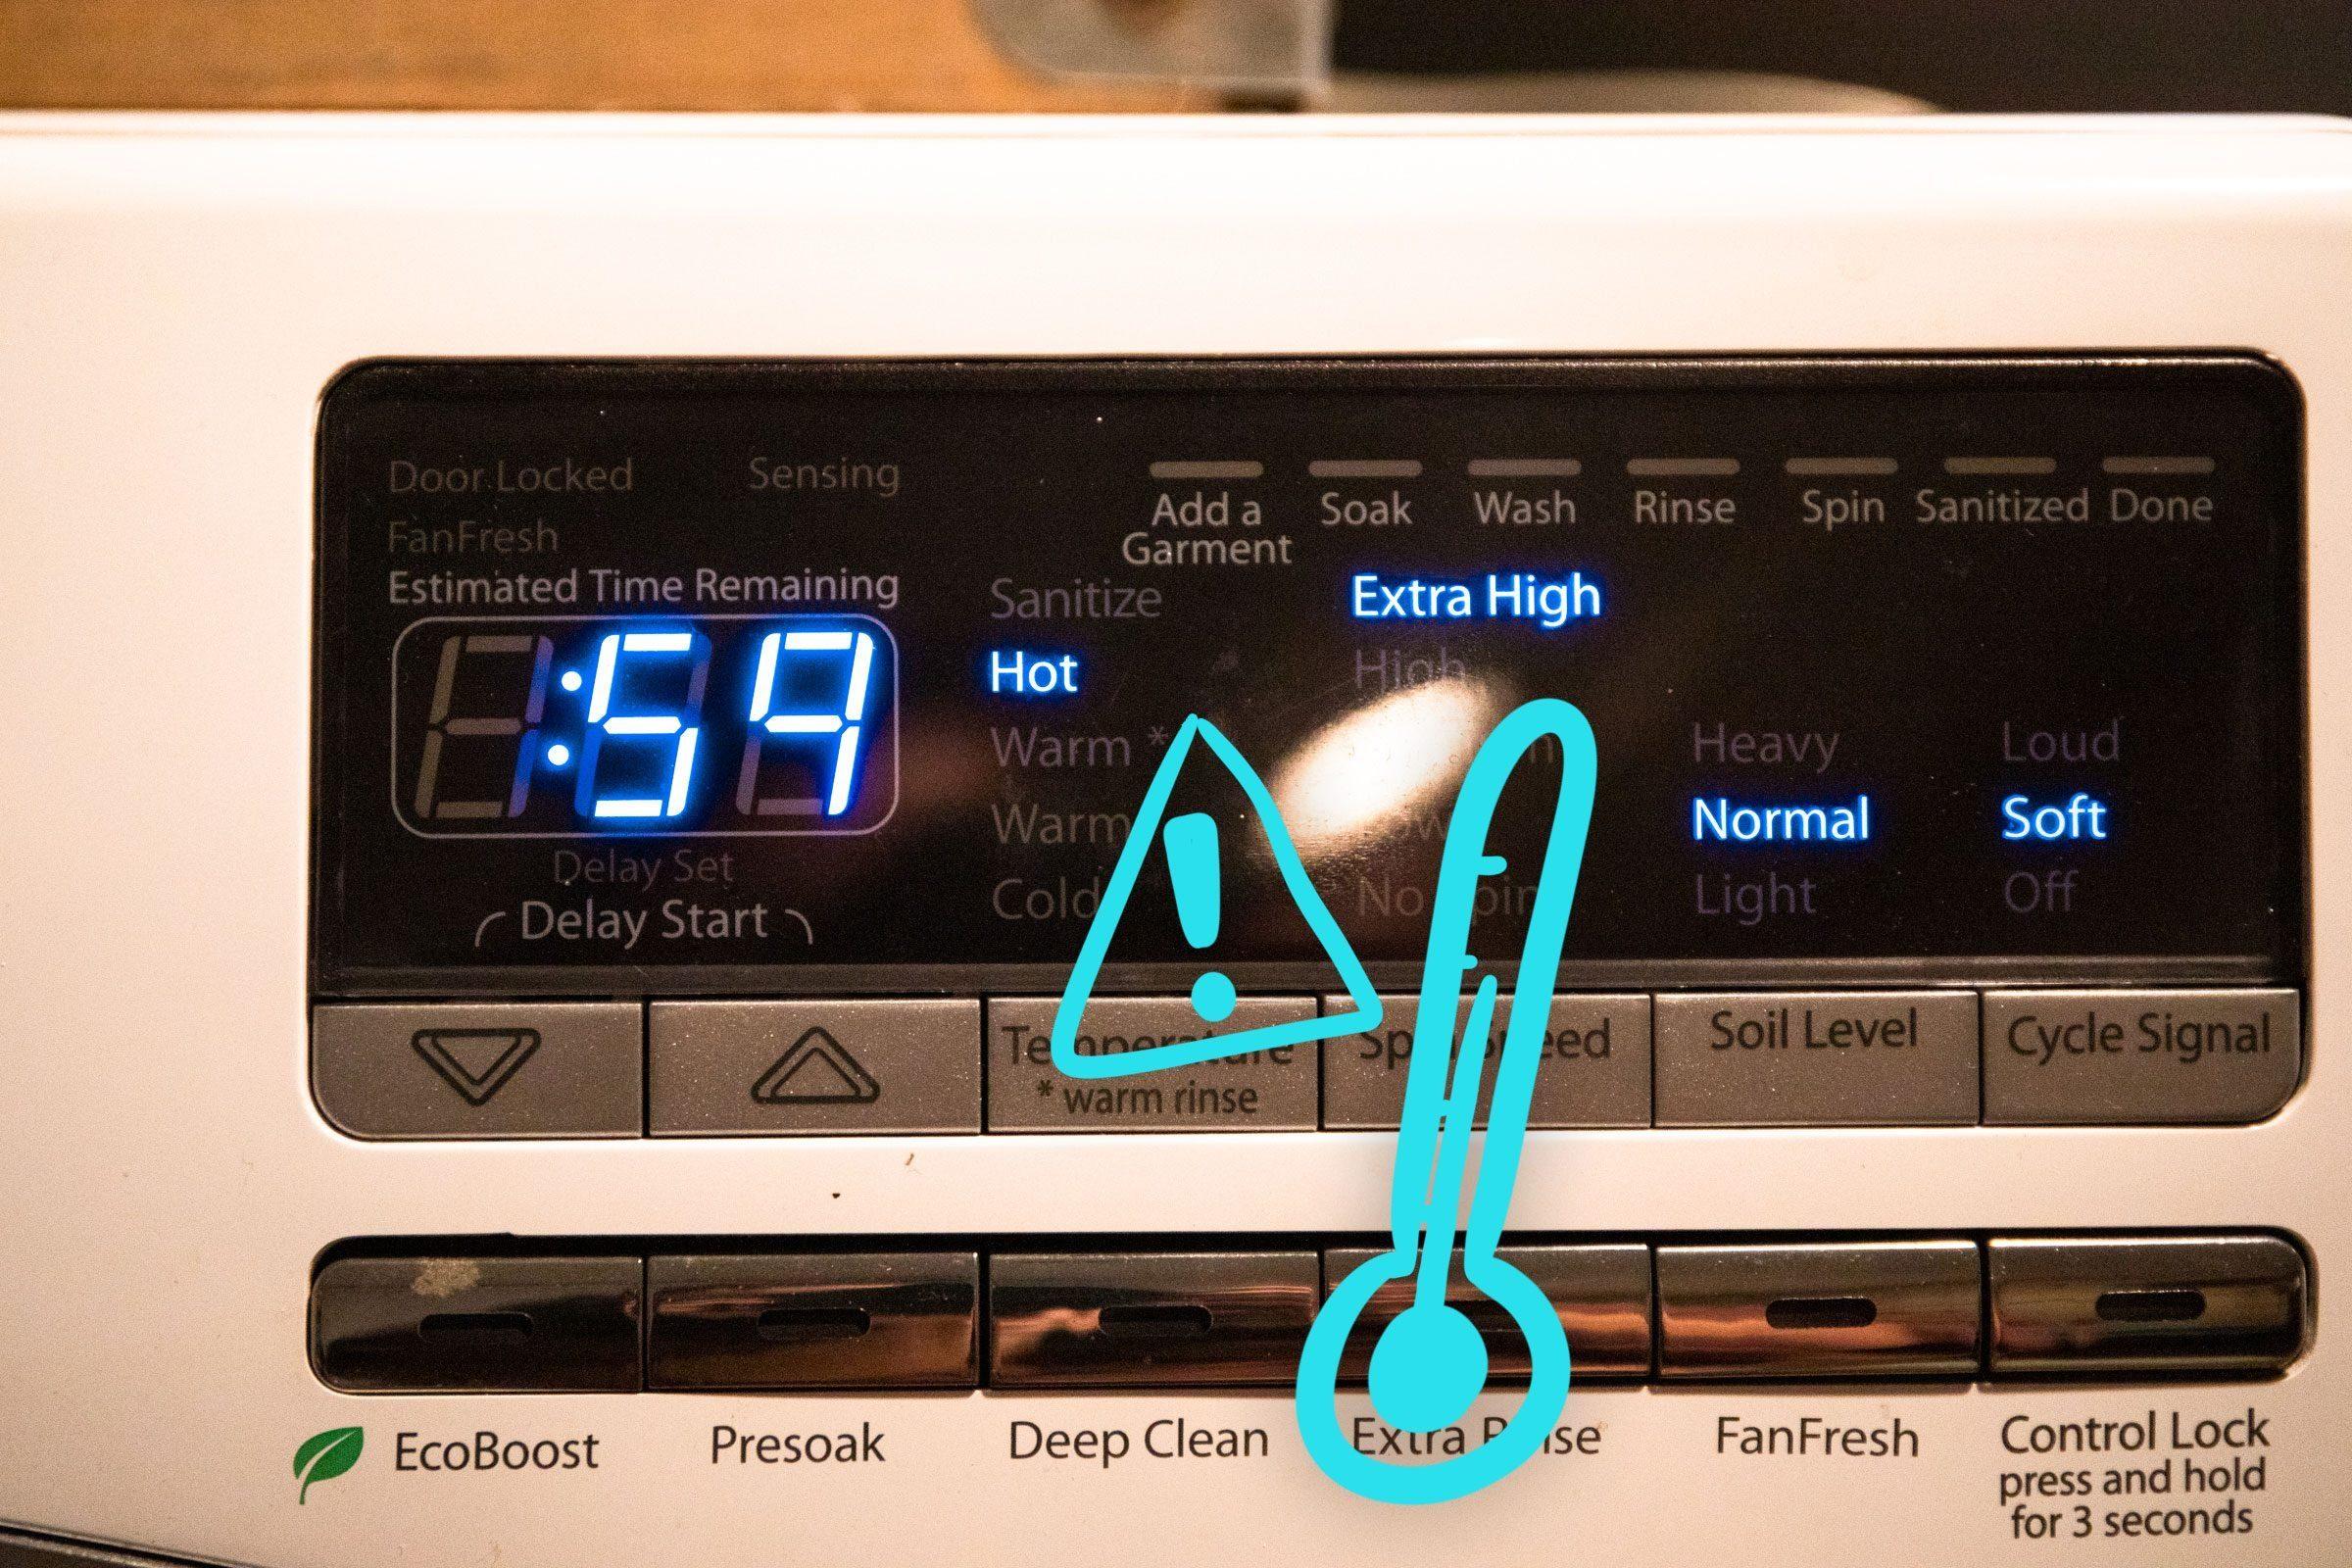 Not hot enough!